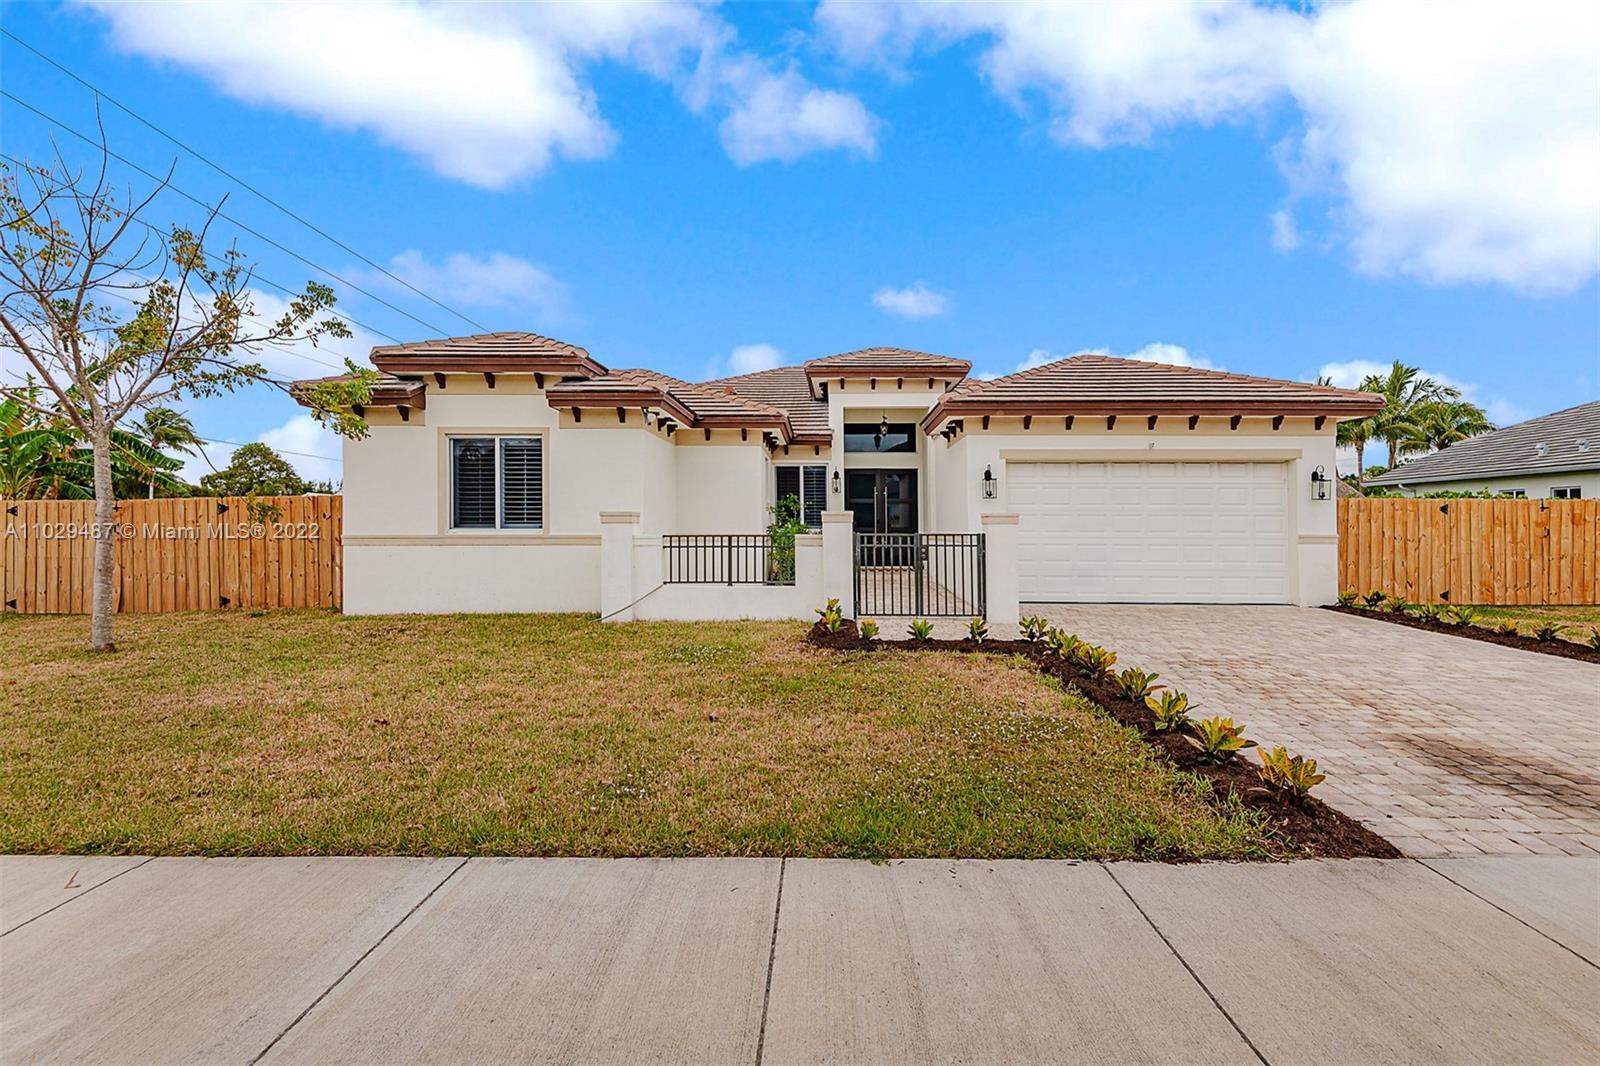 Home for sale in Costa Brava Cutler Bay Florida